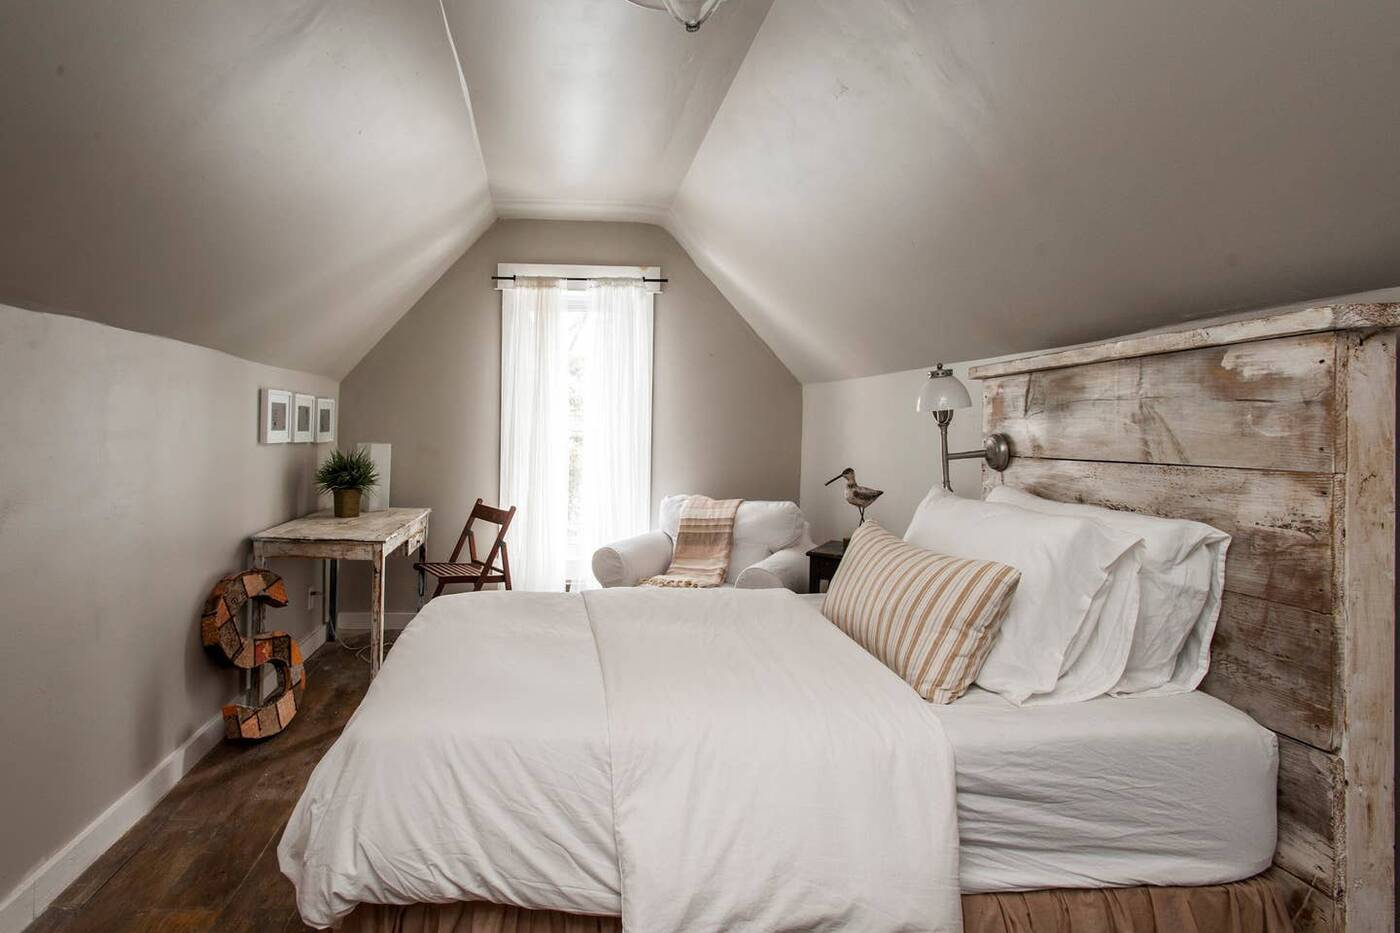 beaches airbnb toronto